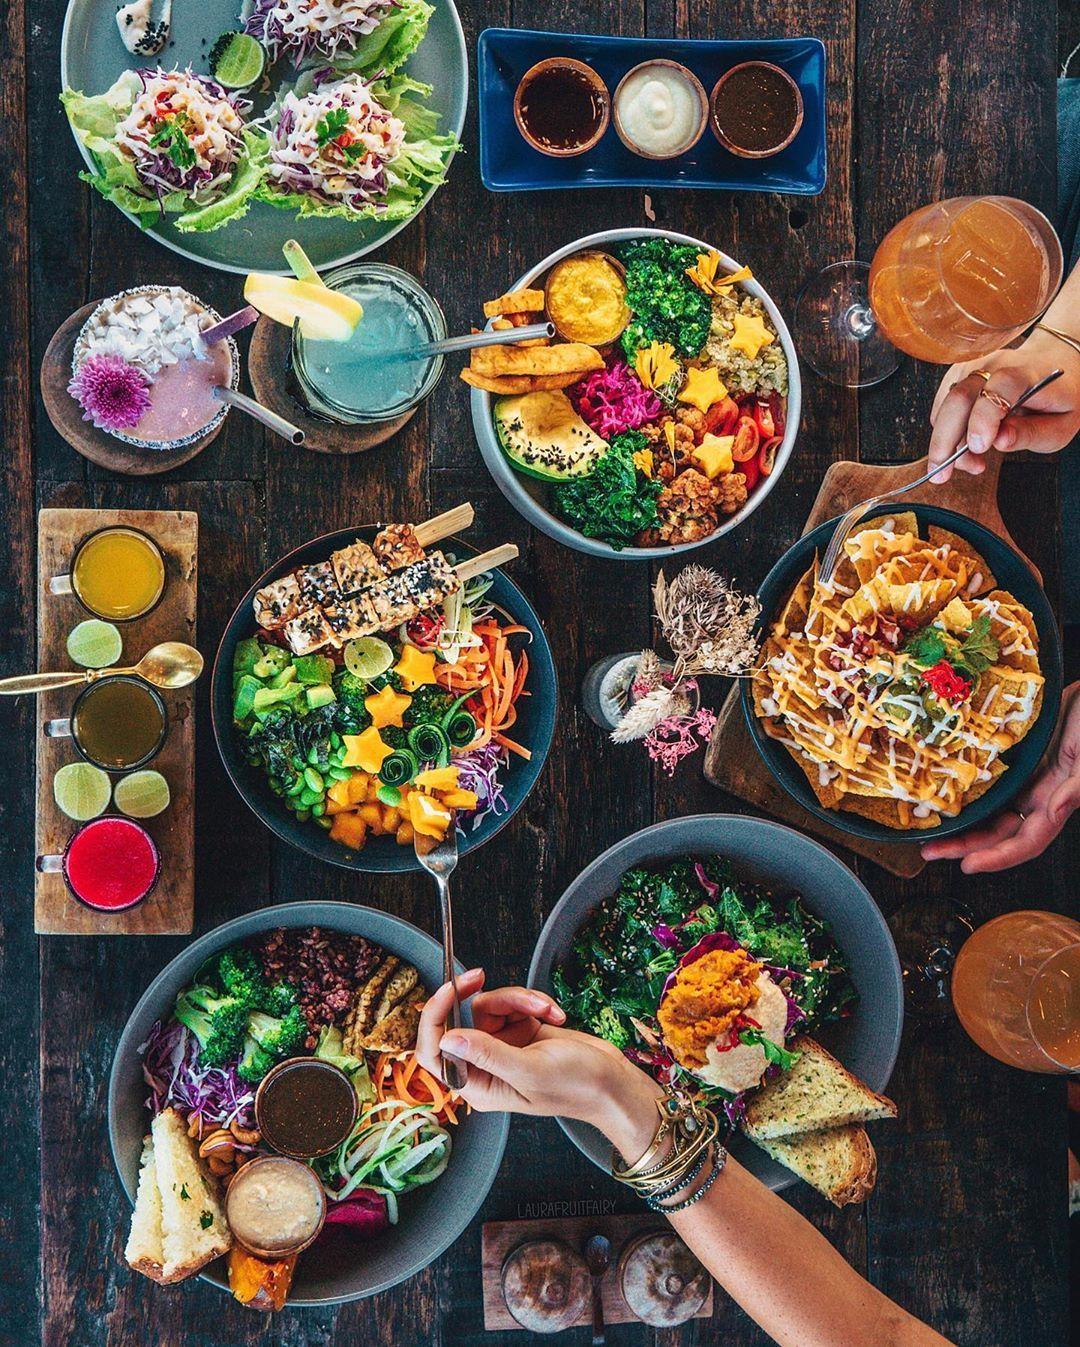 10 Restaurants With Vegetarian And Vegan Food In Knoxville In 2020 Vegan Restaurants Vegan Recipes Food